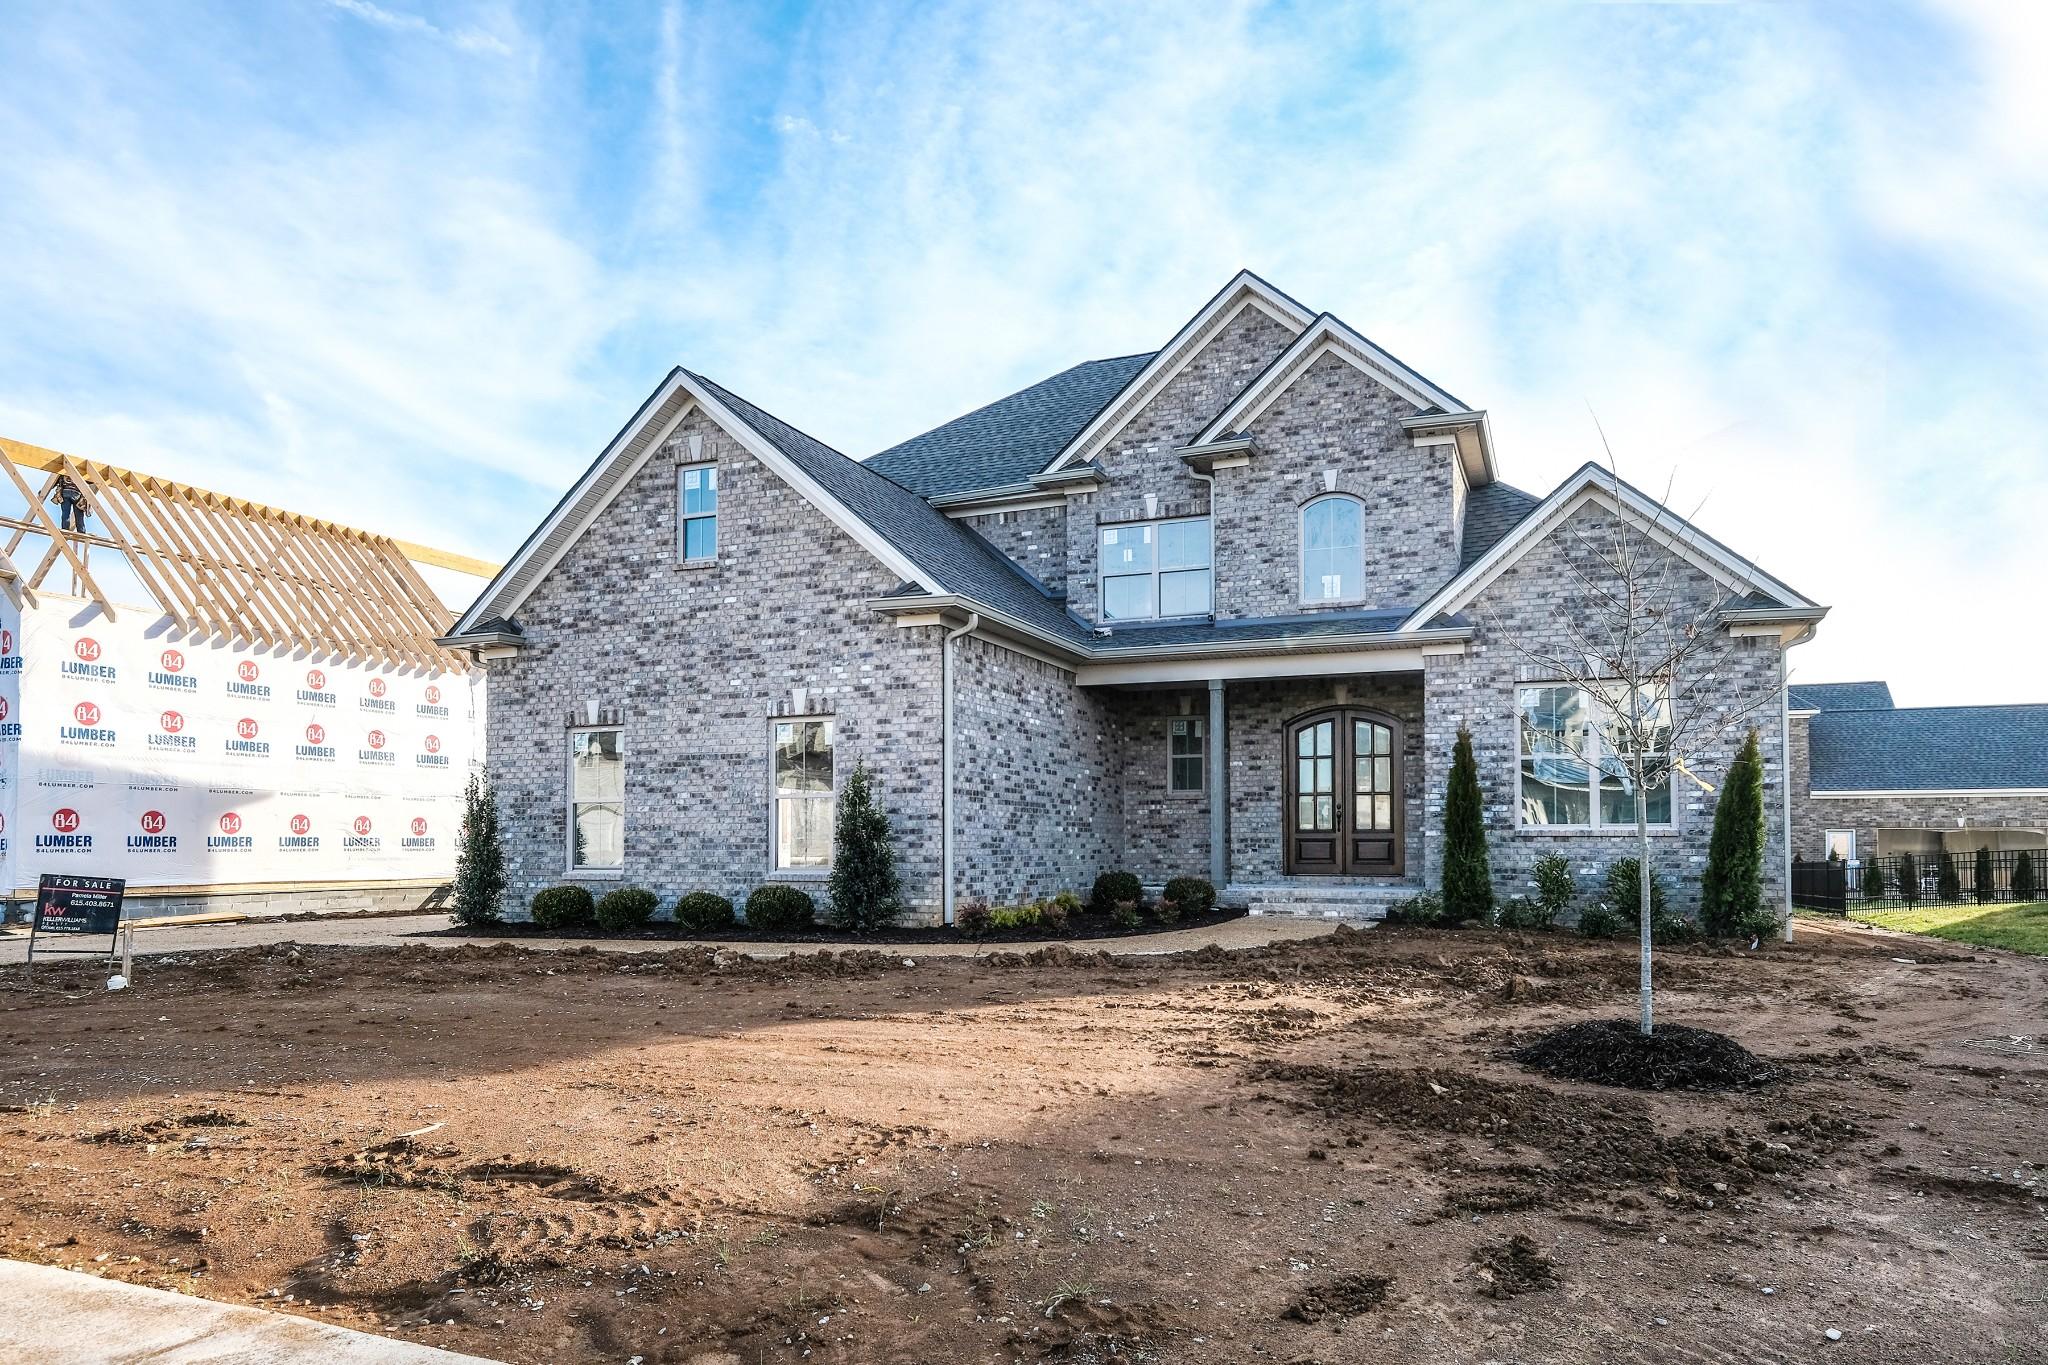 2045 Autumn Ridge Way (Lot 232), Spring Hill, TN 37174 - Spring Hill, TN real estate listing